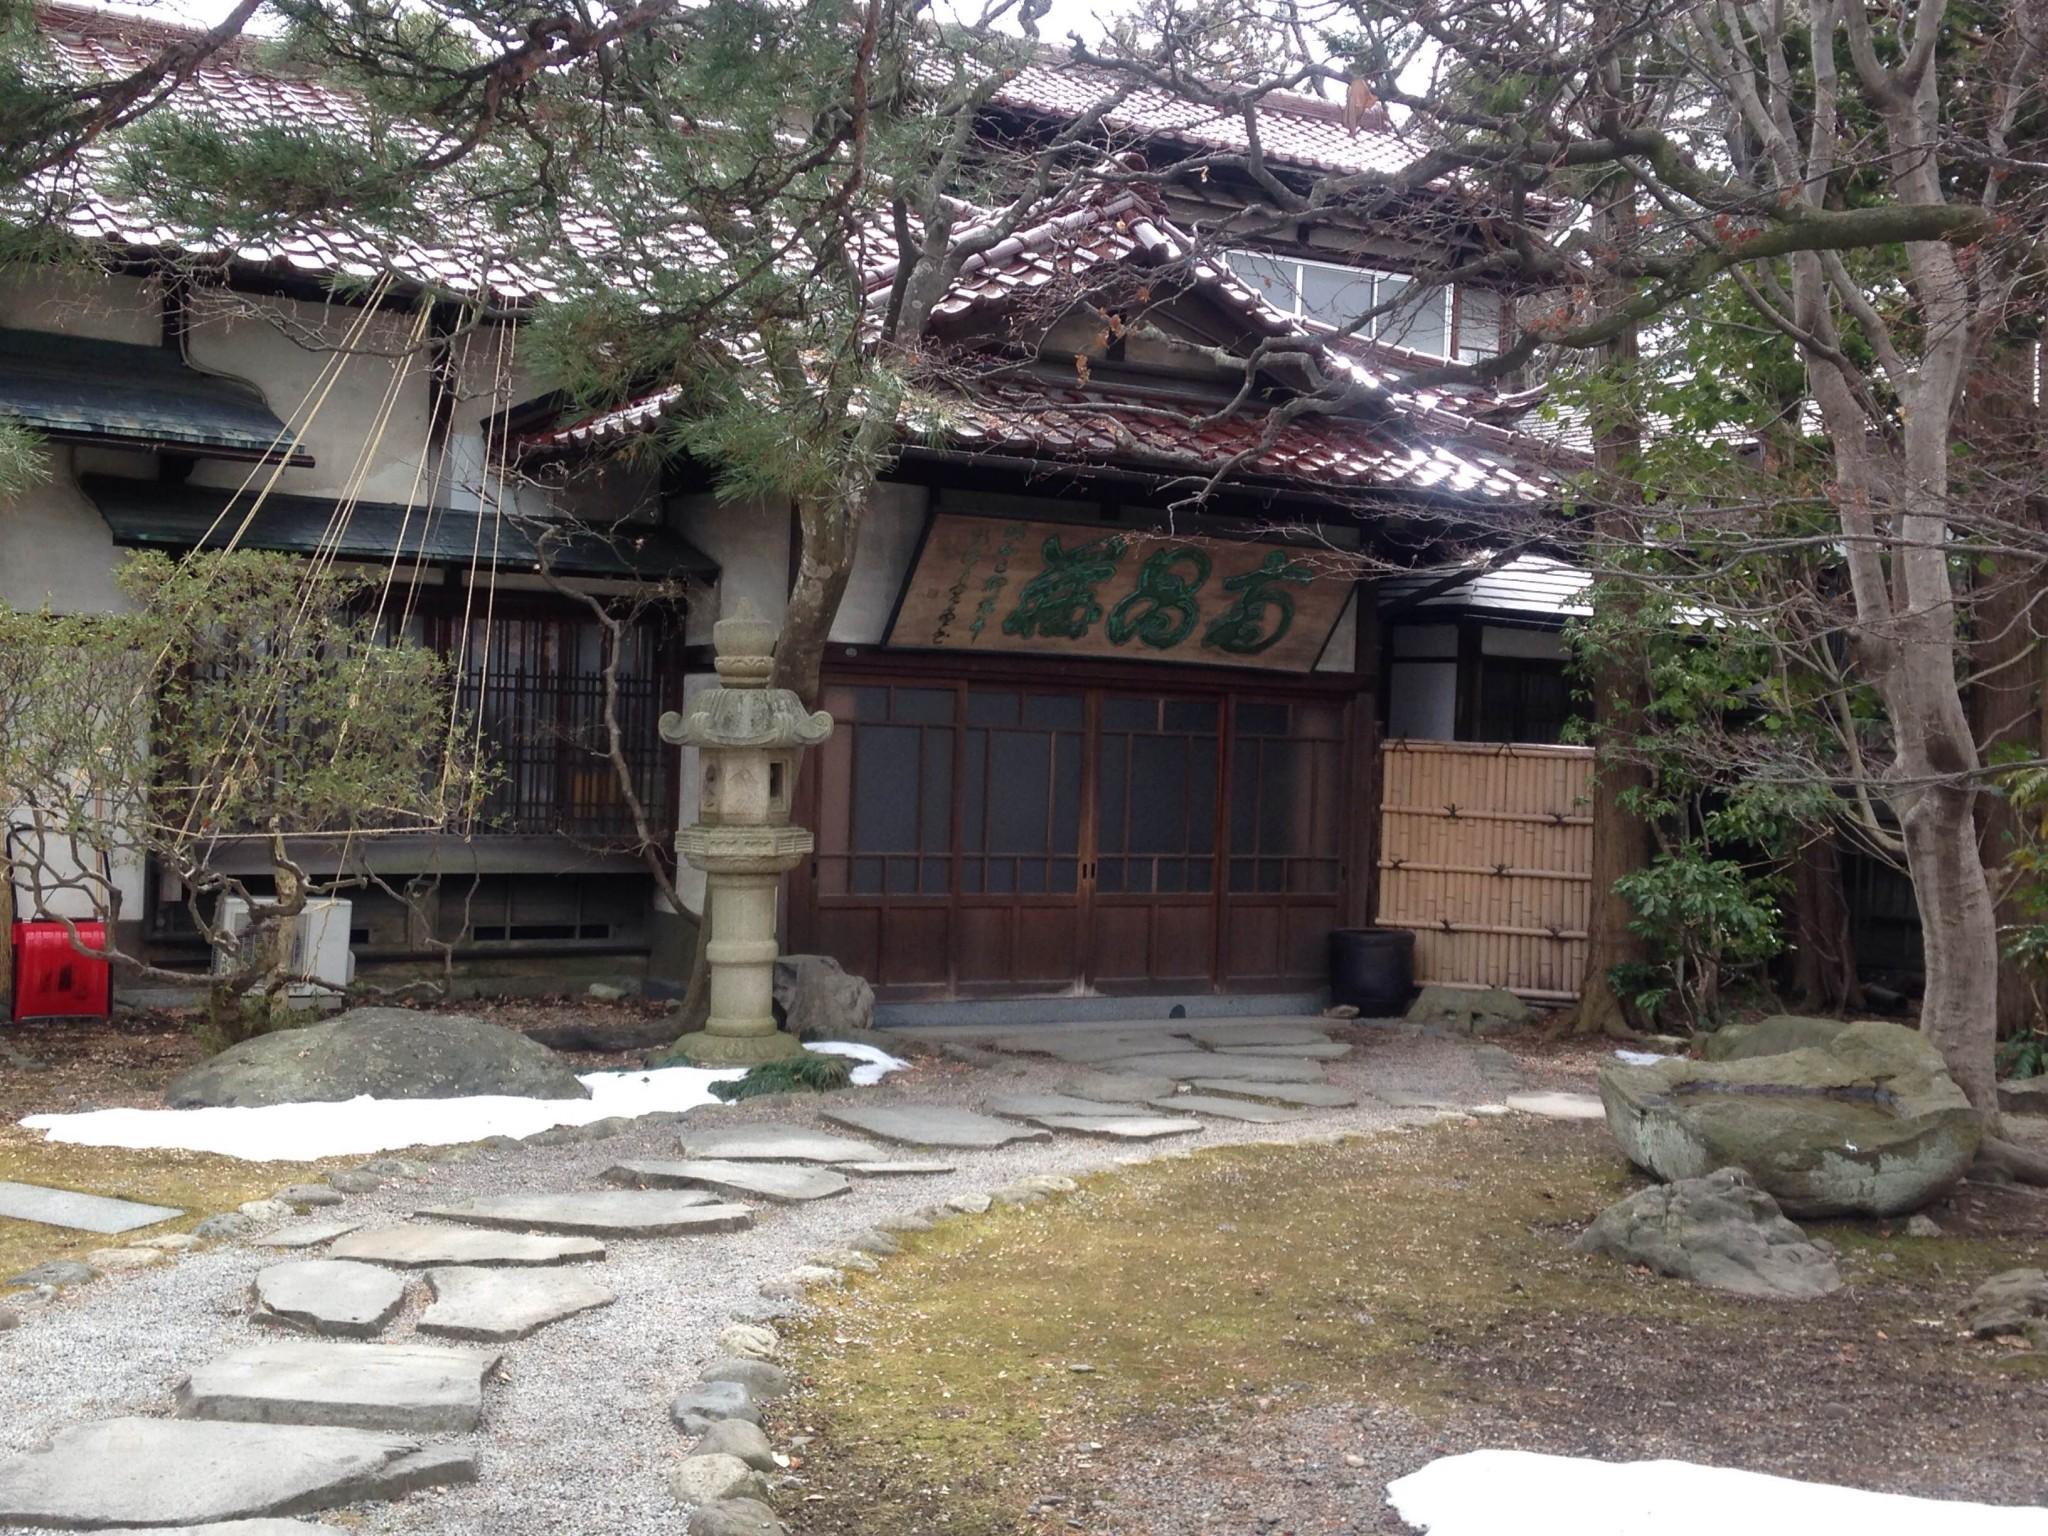 Nanshoso House: A remnant of the Meiji era